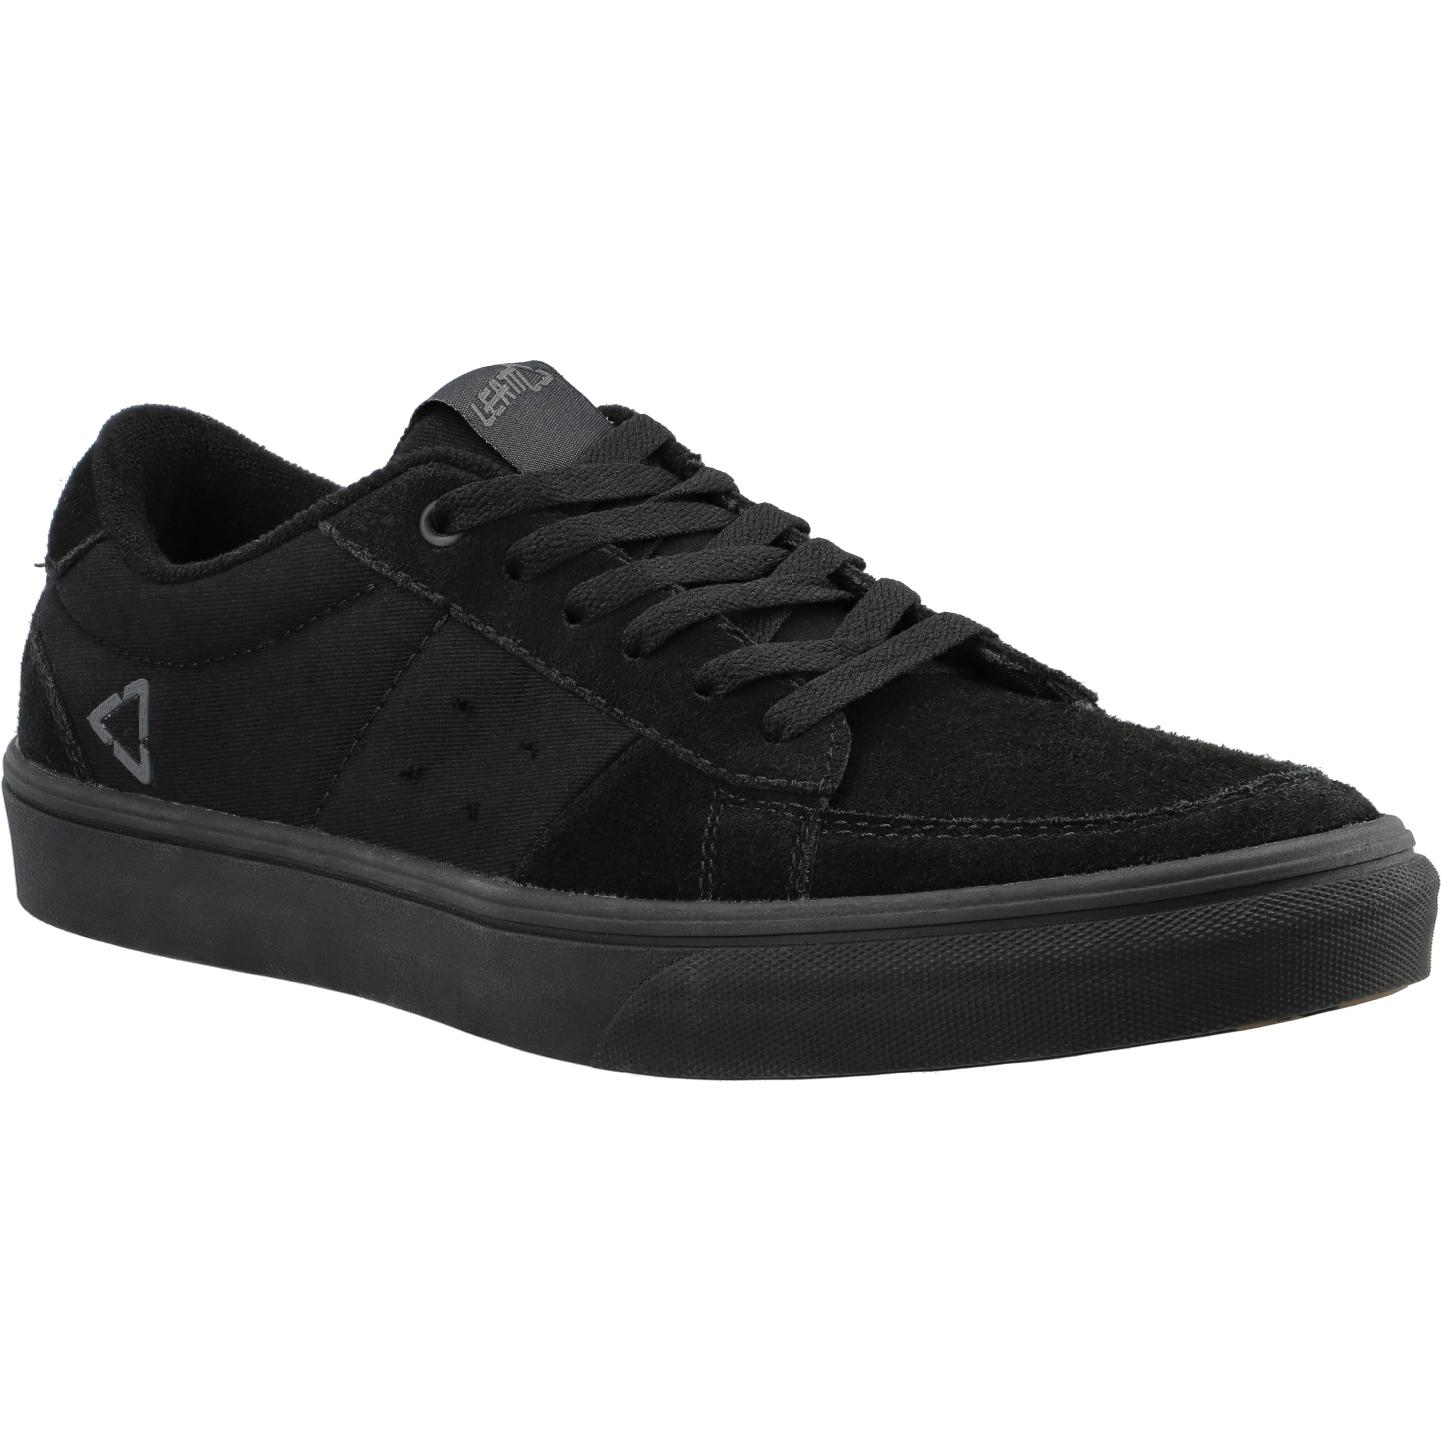 Leatt DBX 1.0 Flatpedal Shoe - black